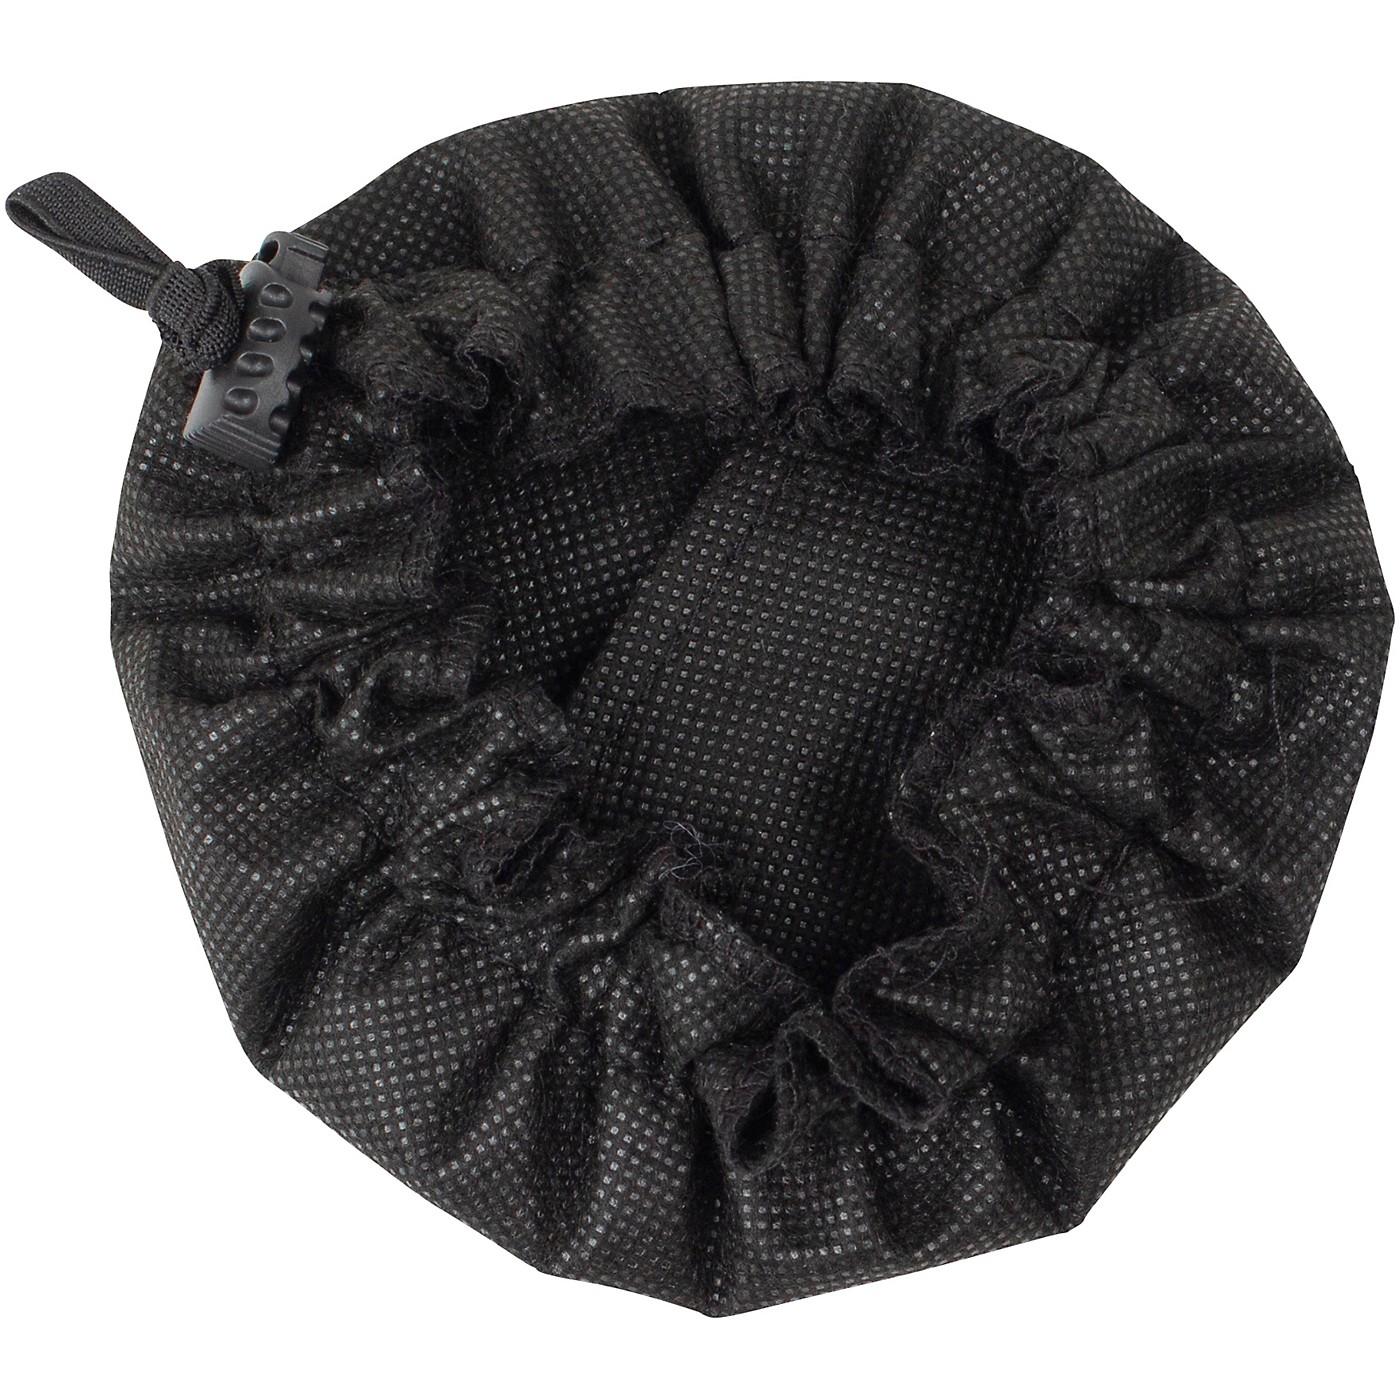 Gator Black Bell Mask With MERV 13 Filter, 2-3